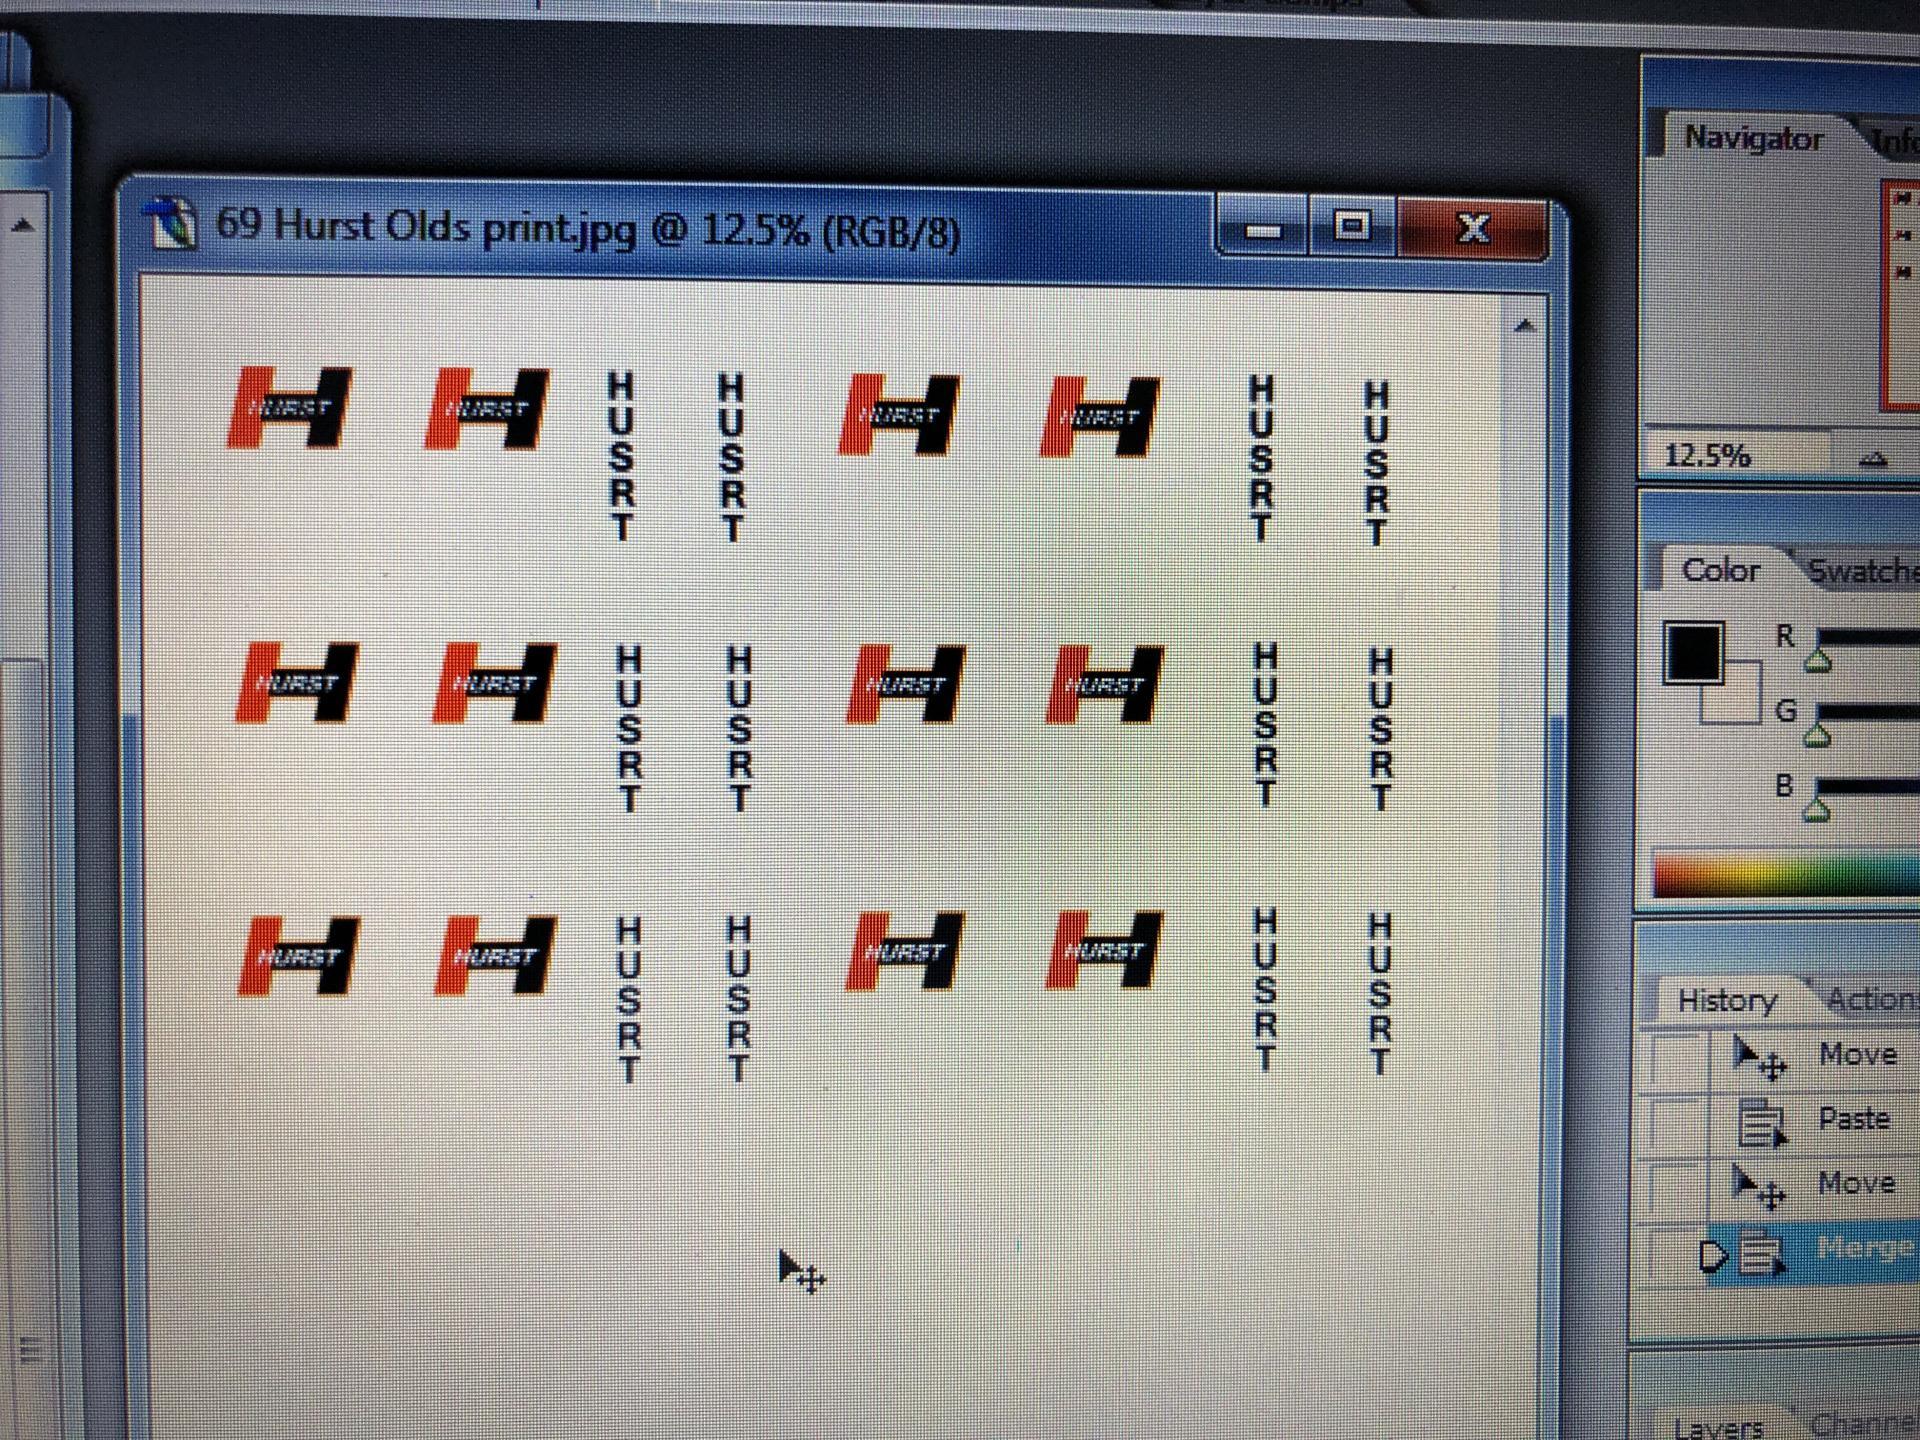 4AD5D4BD-3041-49A7-9E95-F6D781D68C96.thumb.jpeg.be7c977328f937091e3260d1584a3a70.jpeg